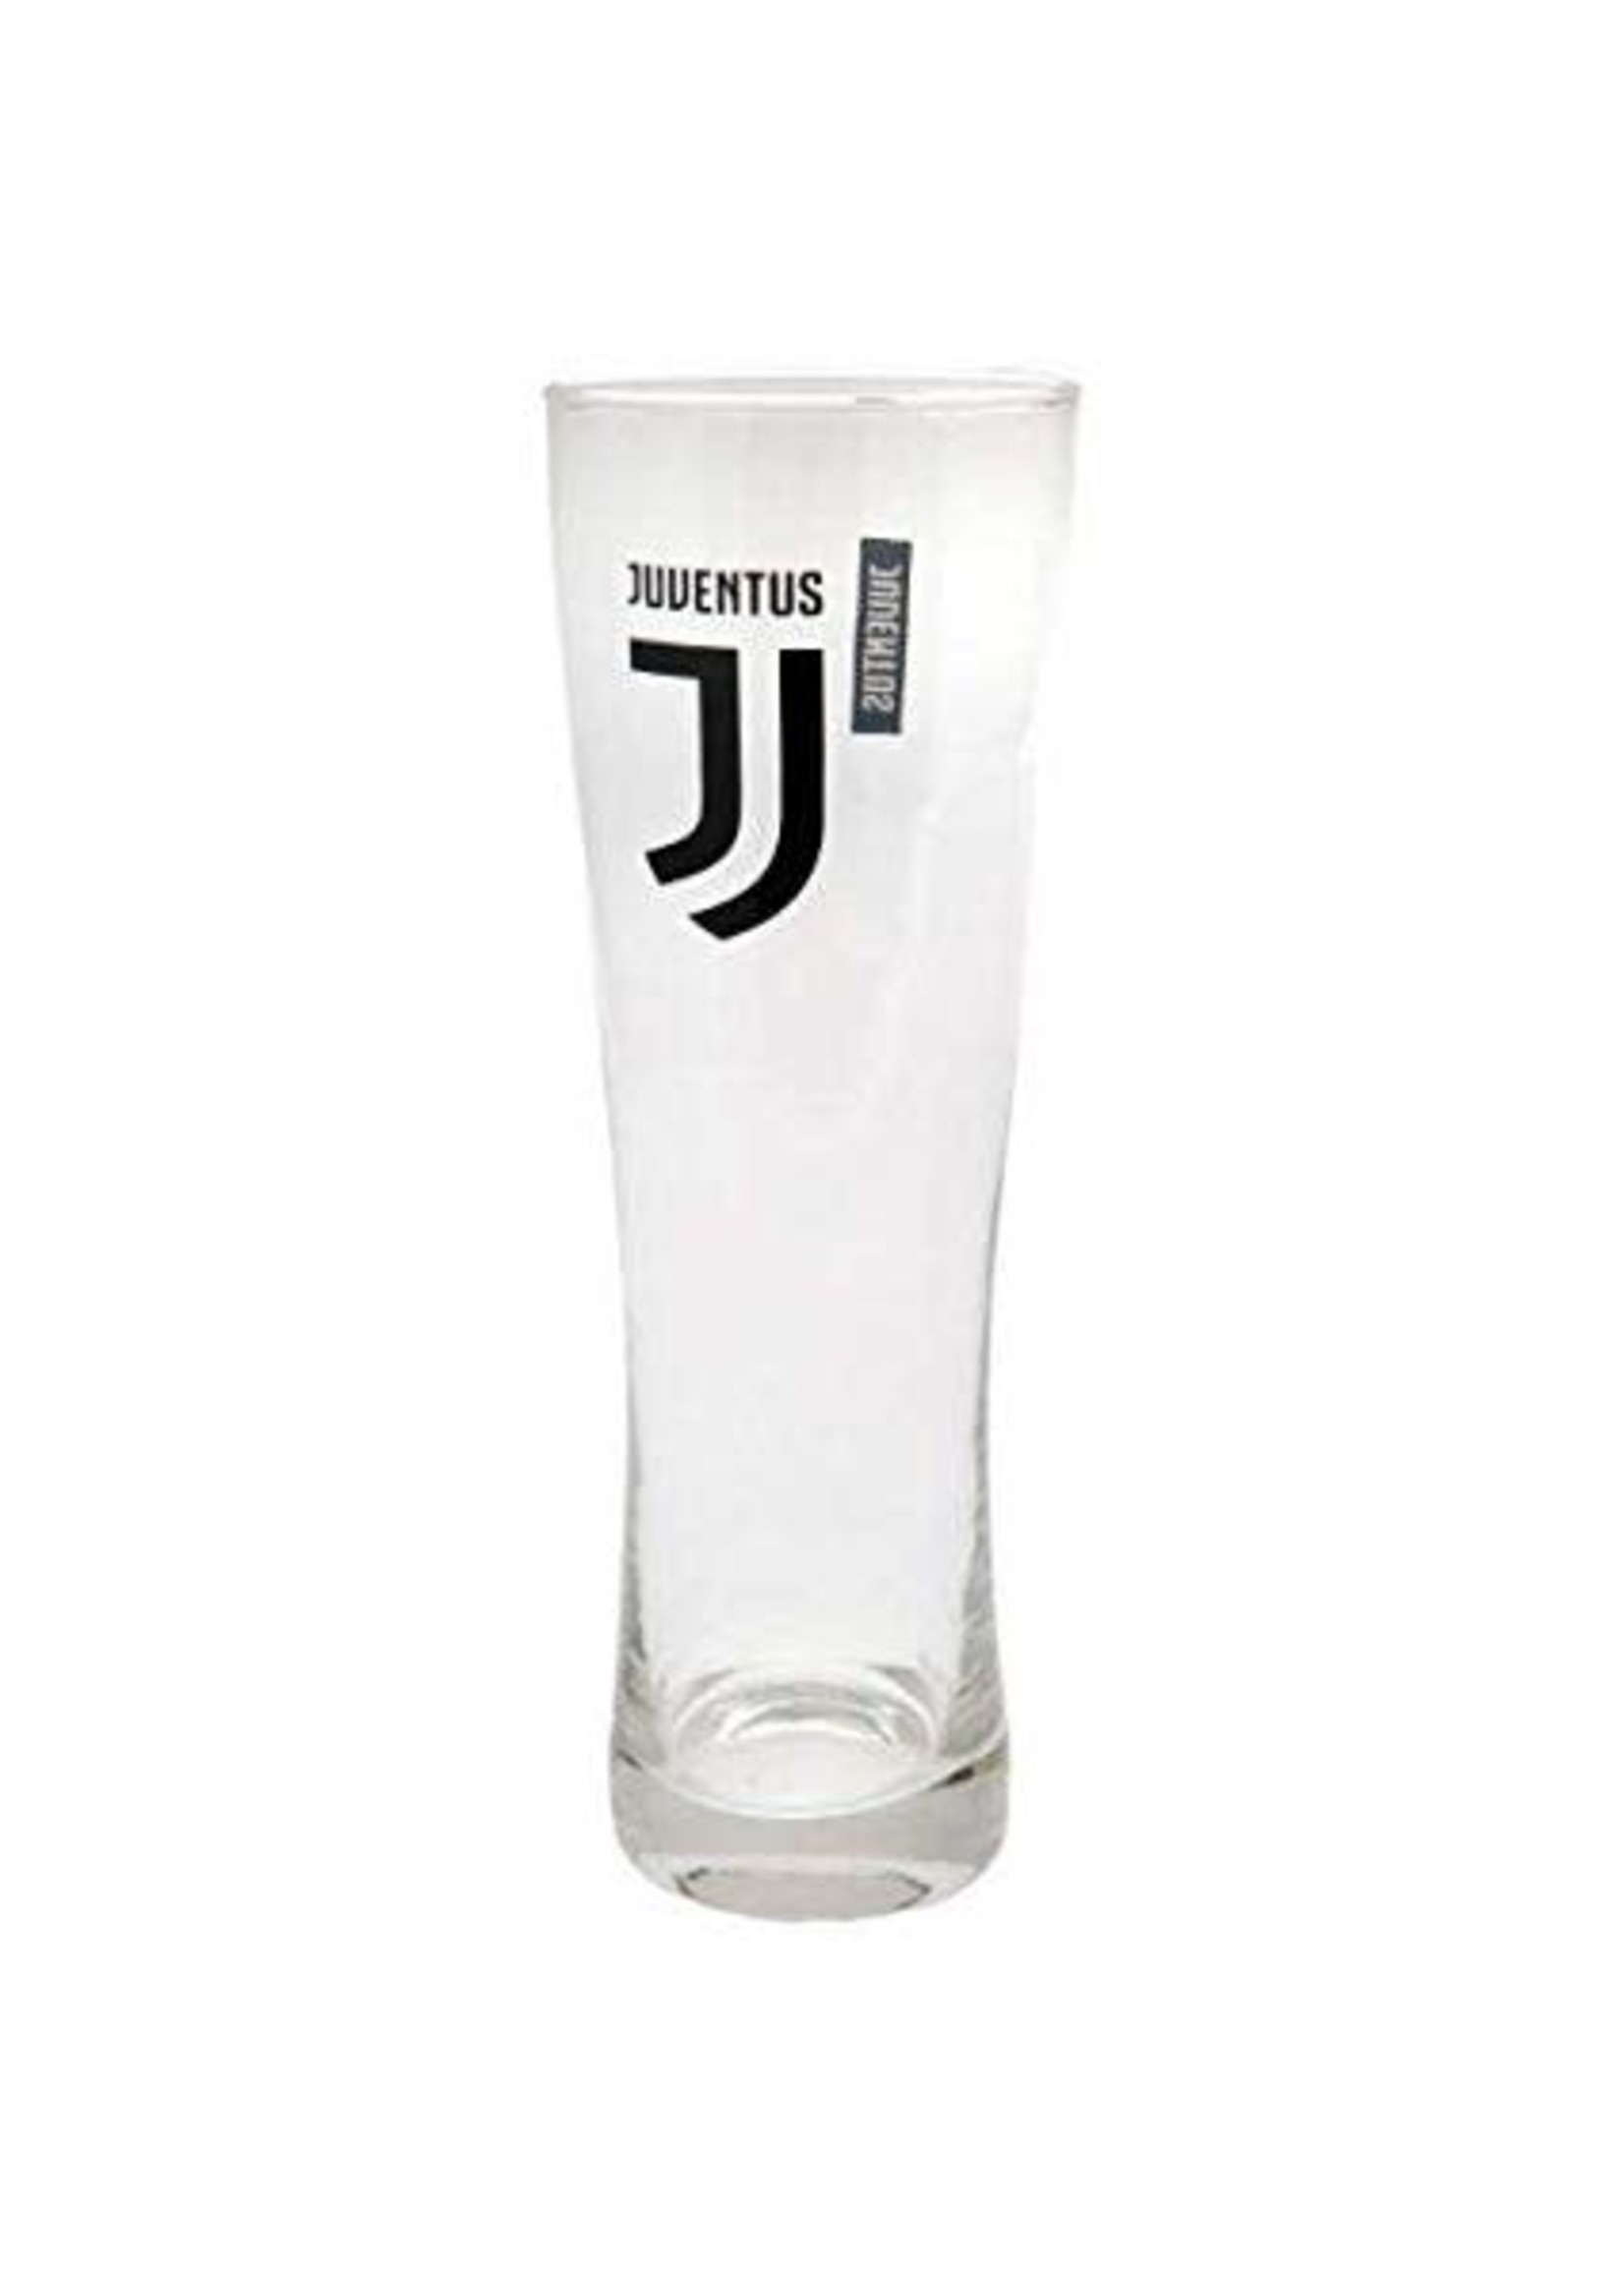 Juventus Tall Slim Pint Glass